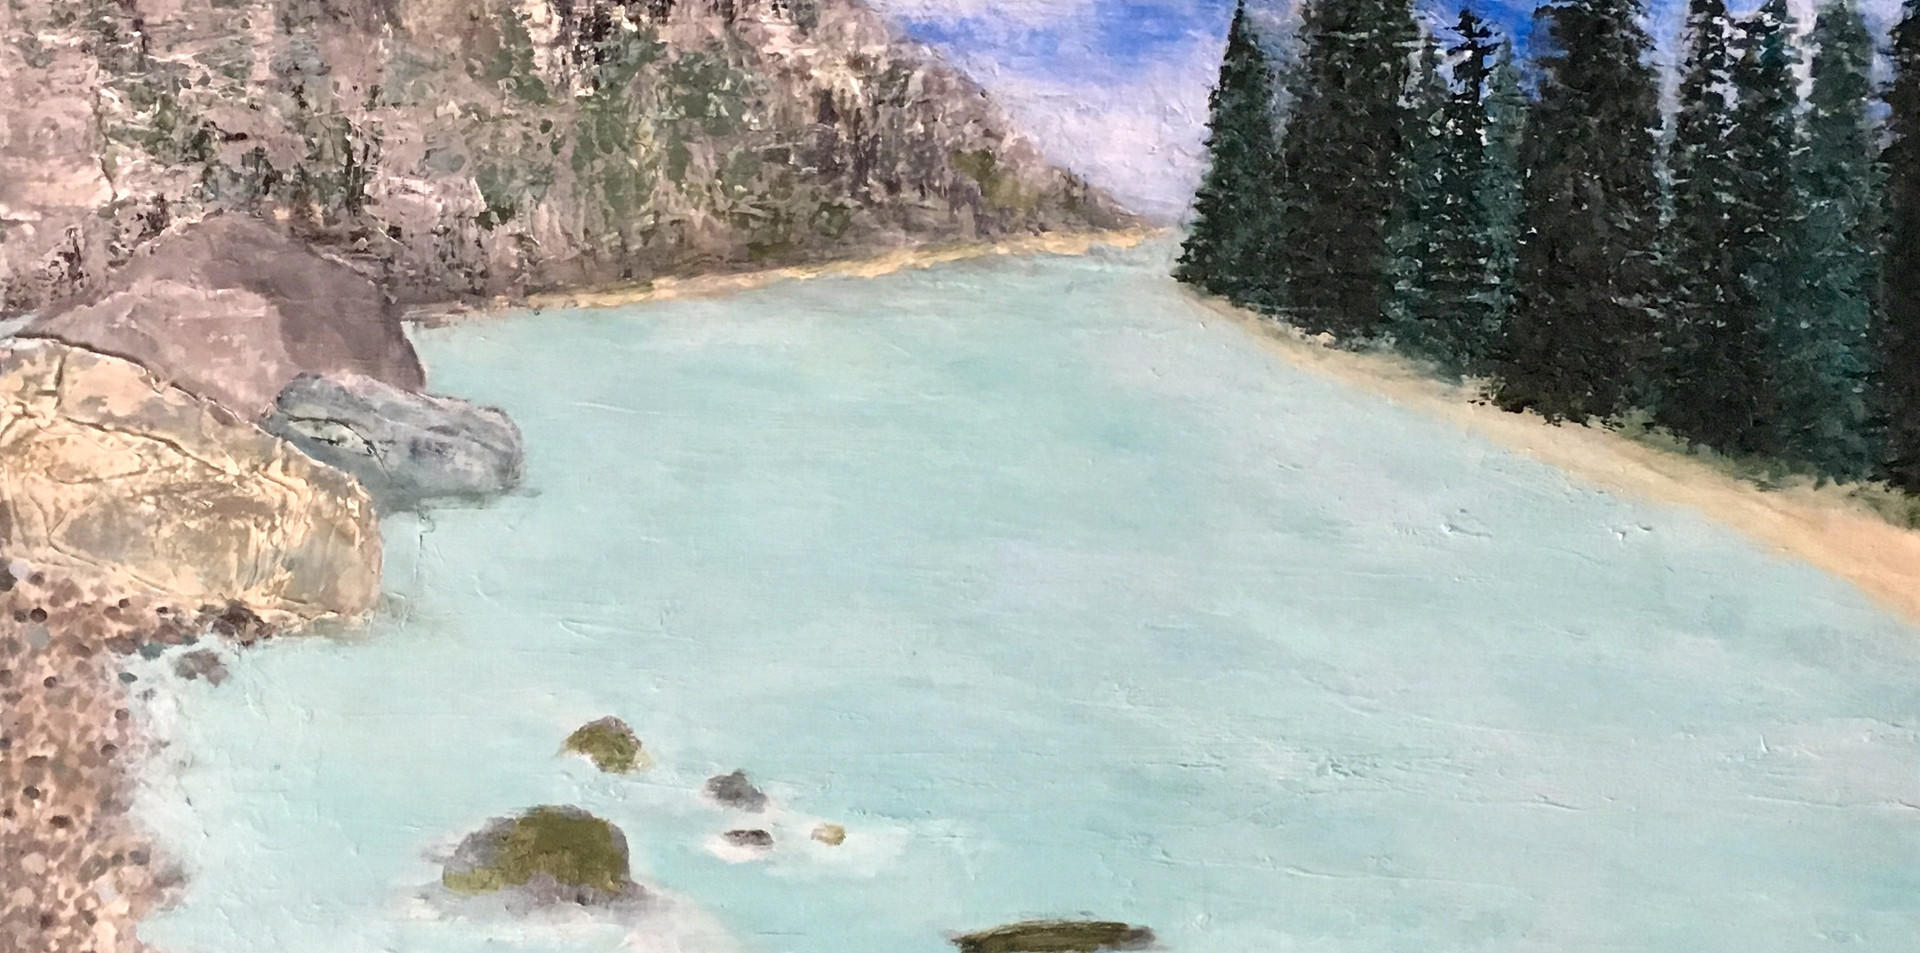 Rambling River